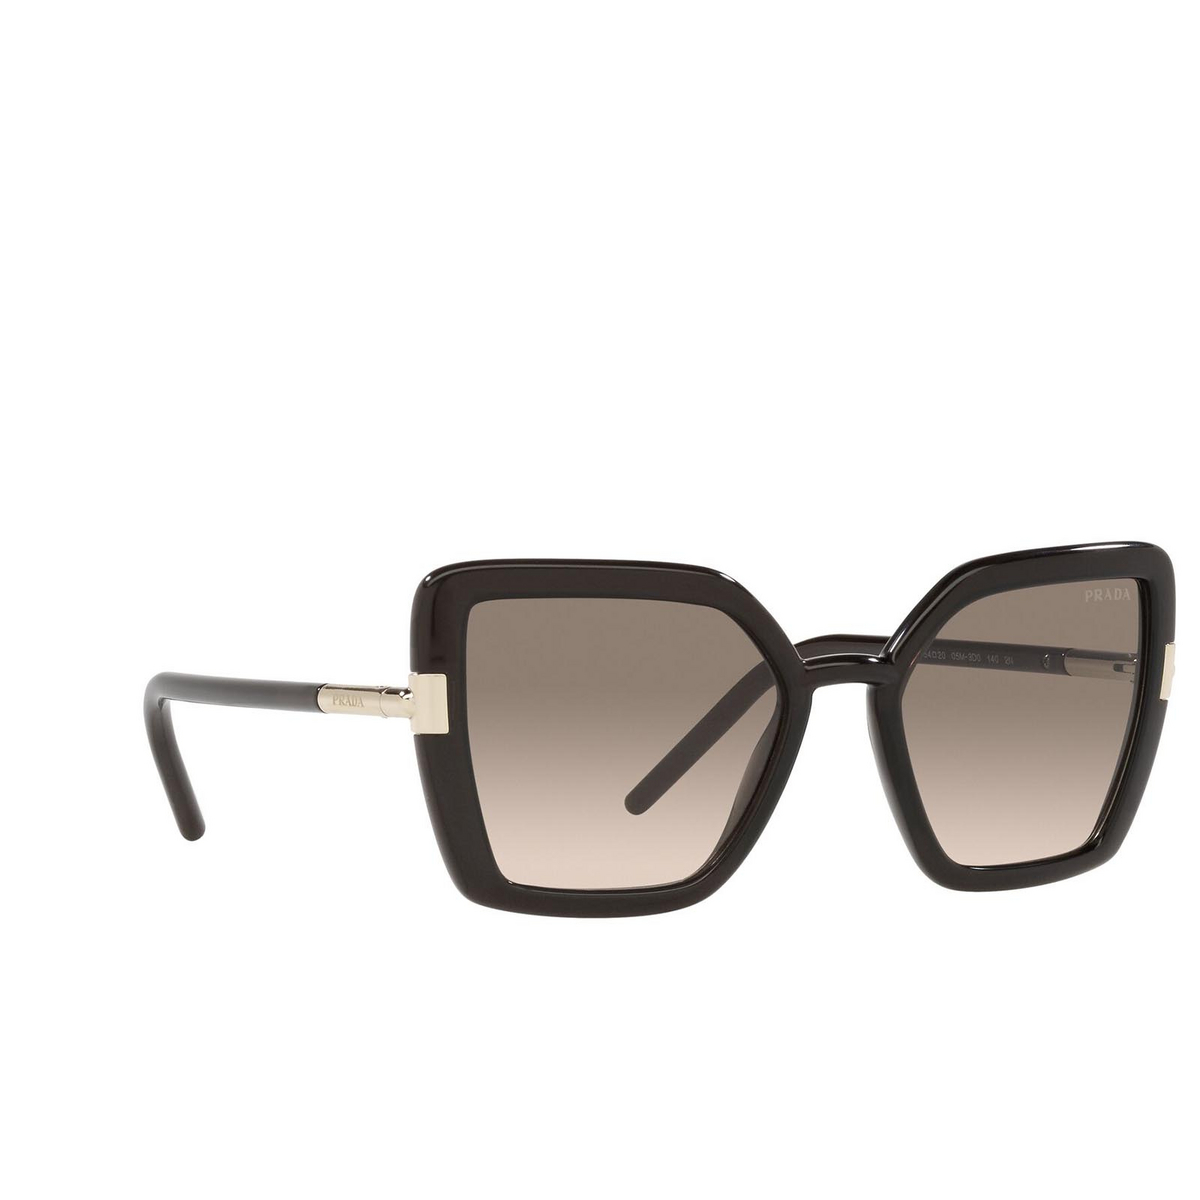 Prada® Butterfly Sunglasses: PR 09WS color Crystal Dark Brown 05M3D0 - three-quarters view.